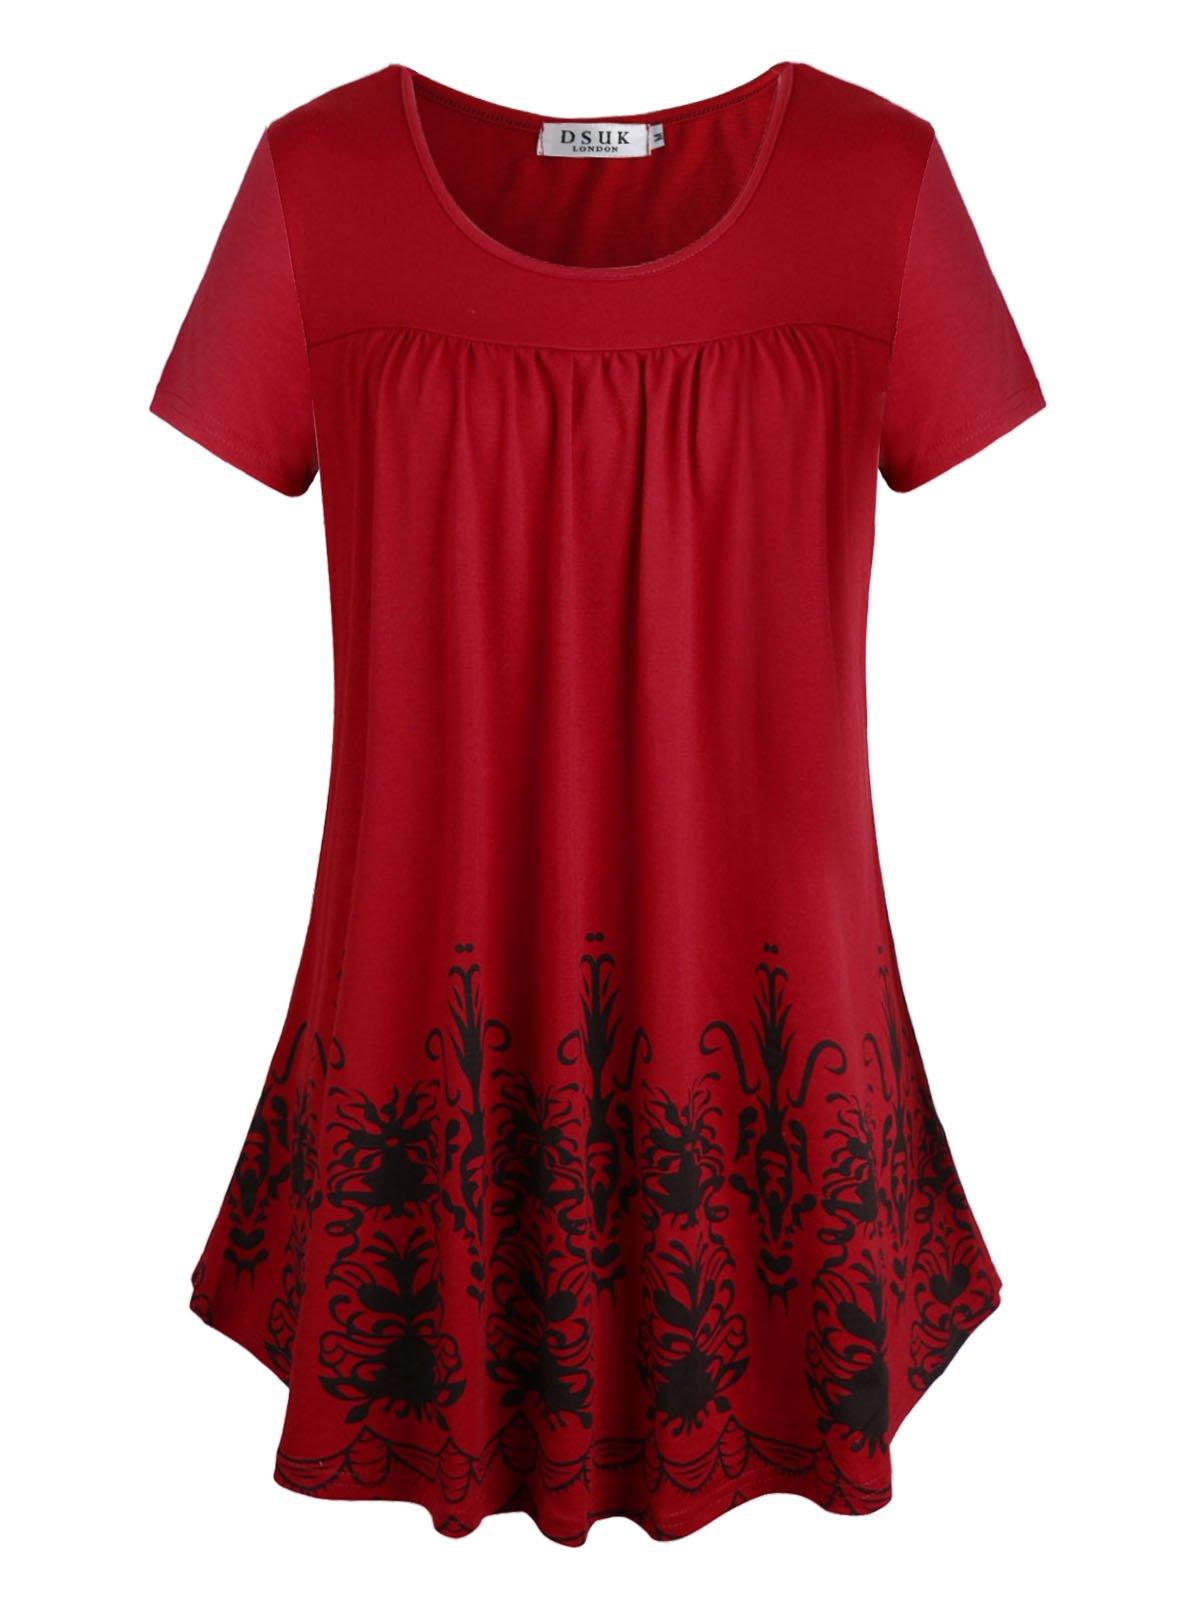 DSUK Ladies Tunics to Wear with Leggings, Women's Flower Printing Draped Hemline Relaxing Dressy New Hot Modern Graceful Vibrant Ruffle Details Versatile Styles Tunic Blouses Wine Red X-Large by DSUK